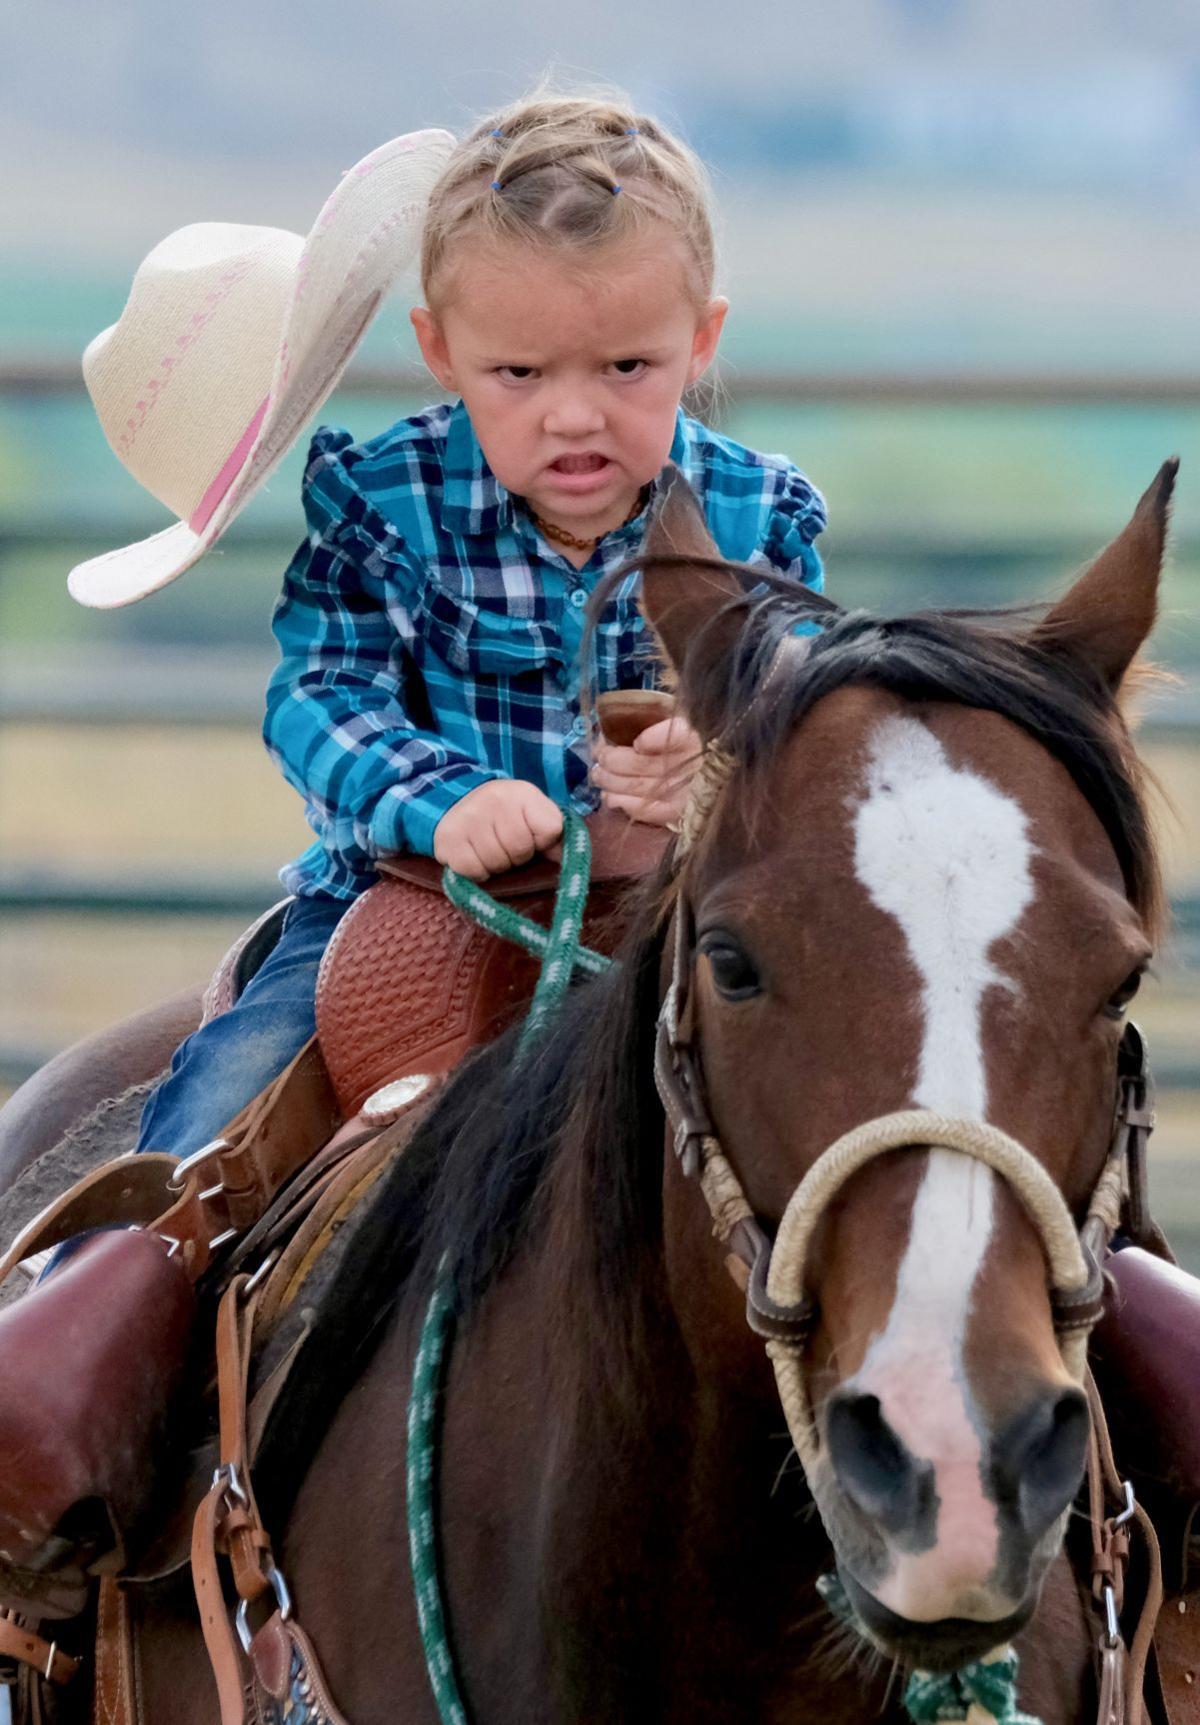 082819 Jefferson County Rodeo Kimber Rintamaki kids rodeo.jpg